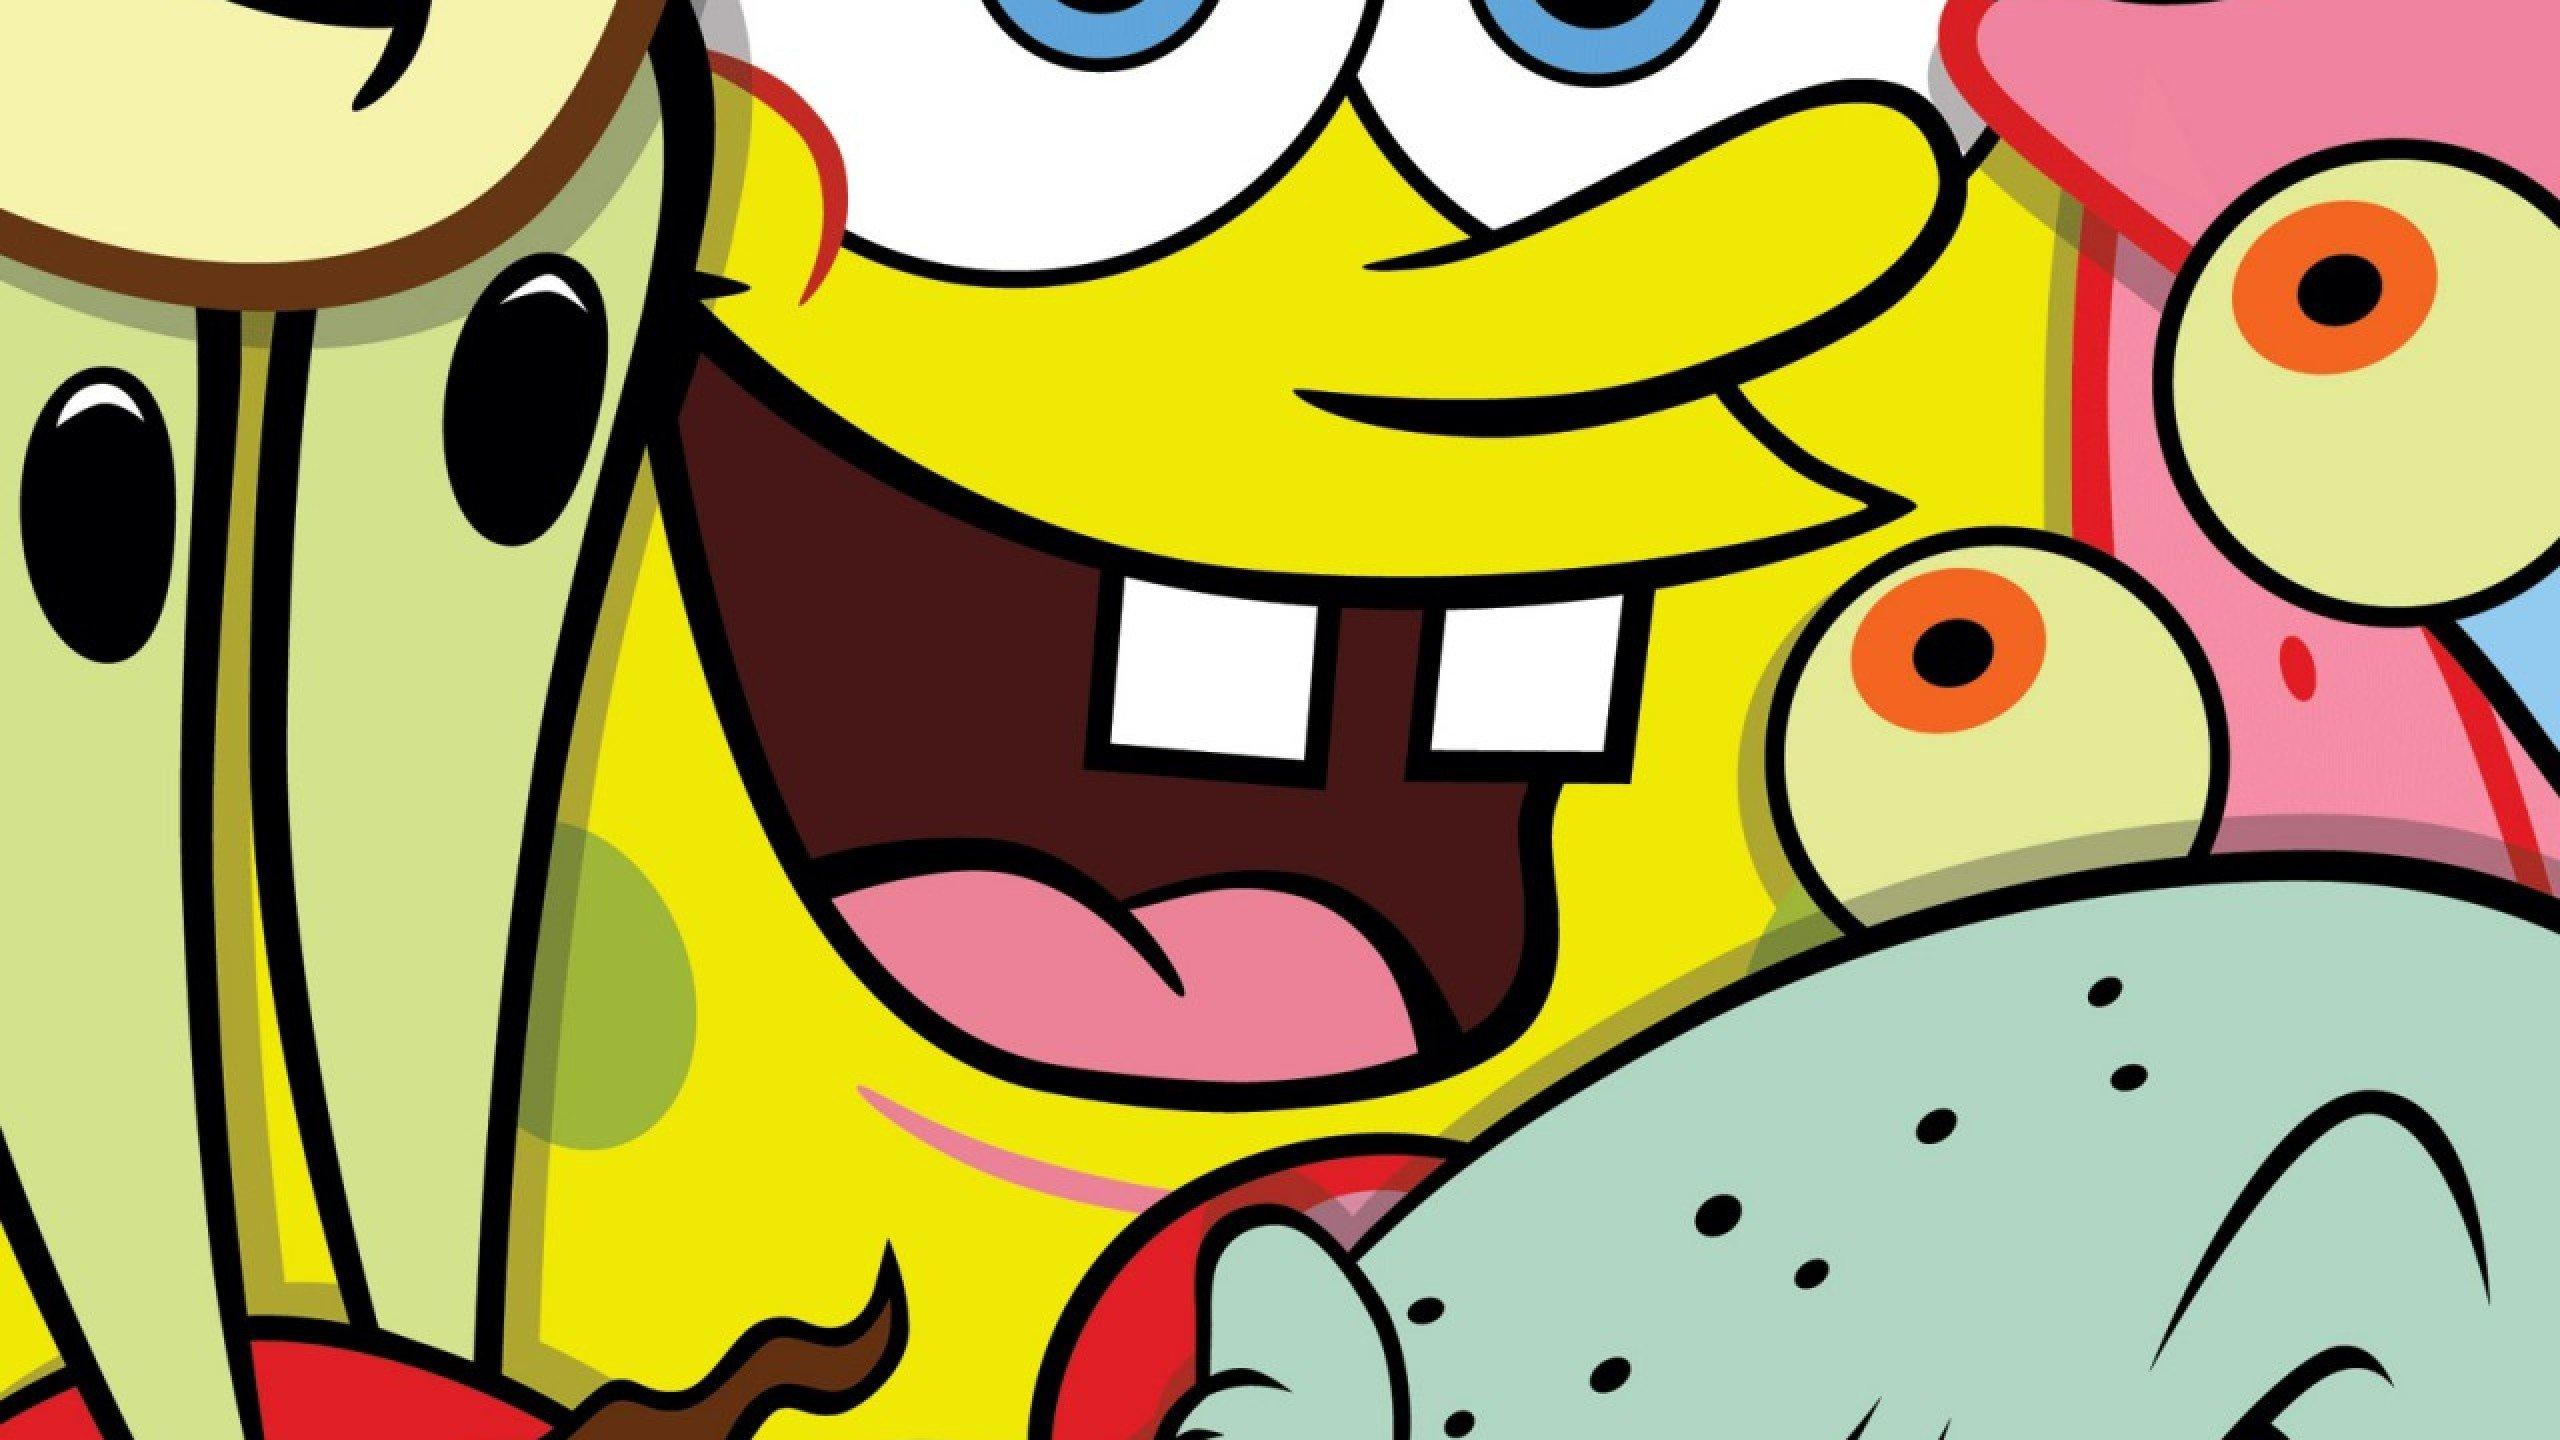 spongebob squarepants cartoon family animation wallpaper